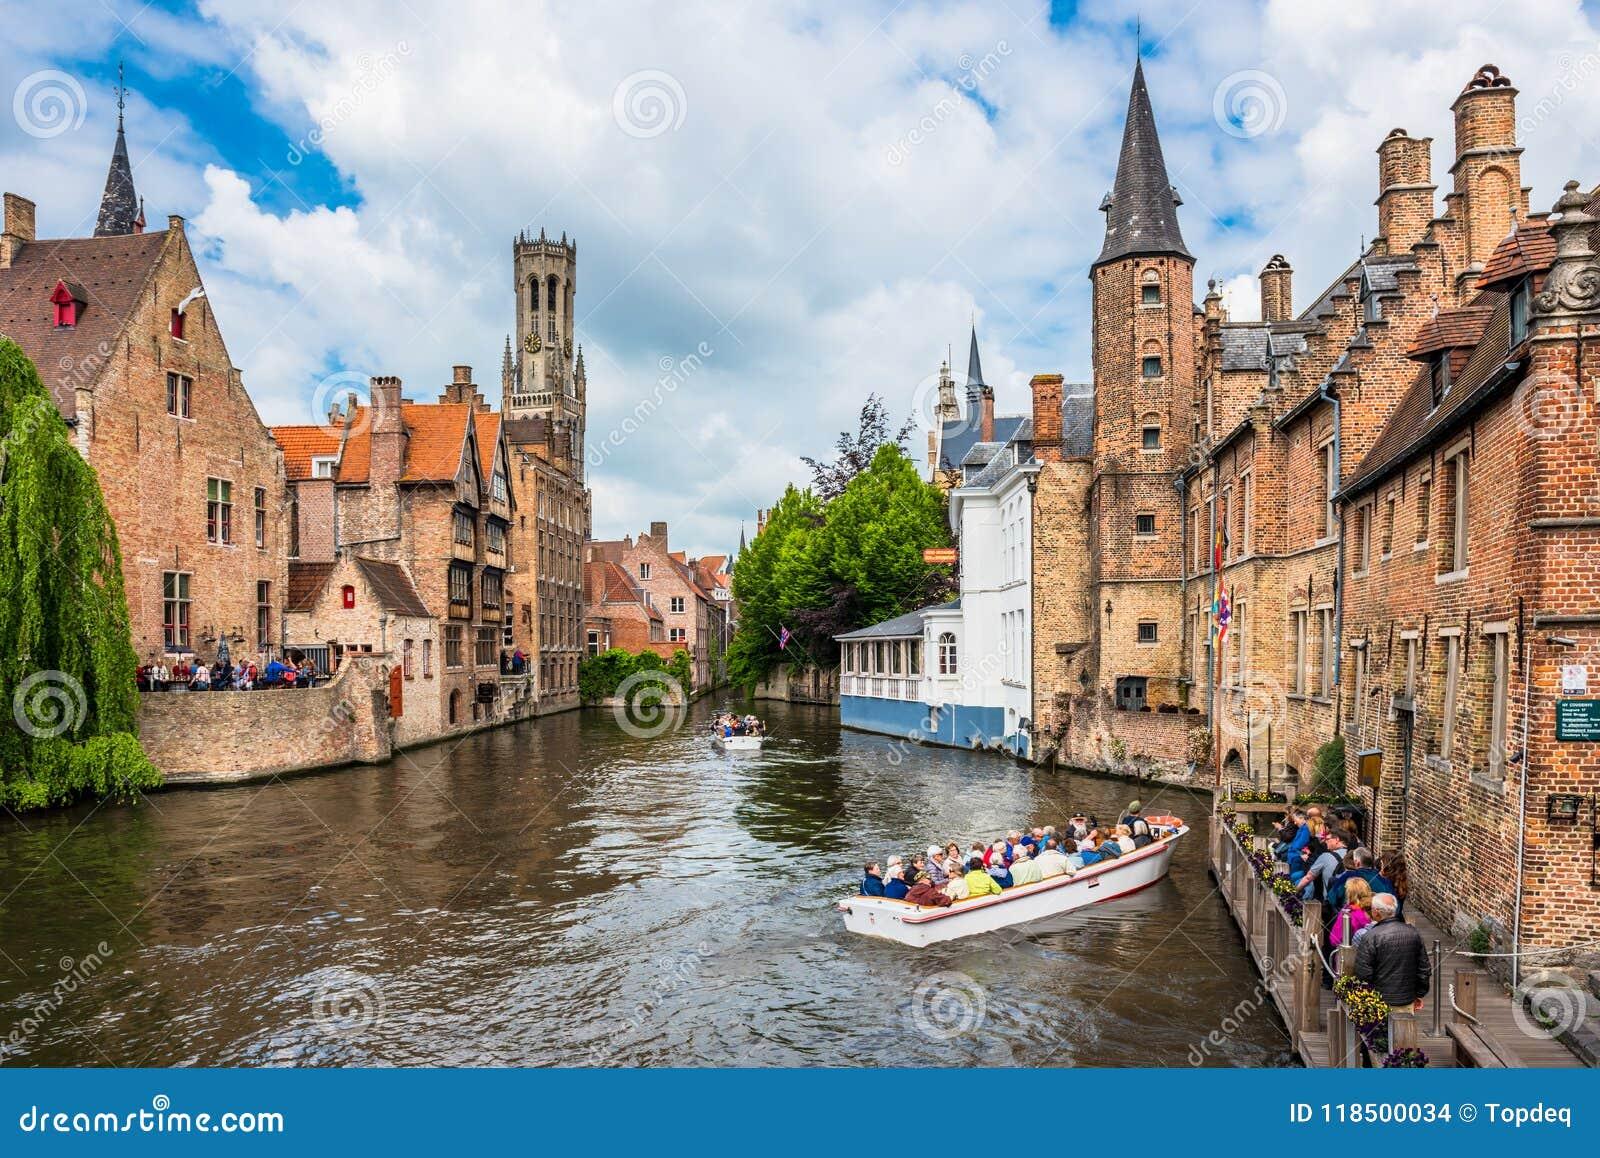 Boats full of tourist enjoying Bruges